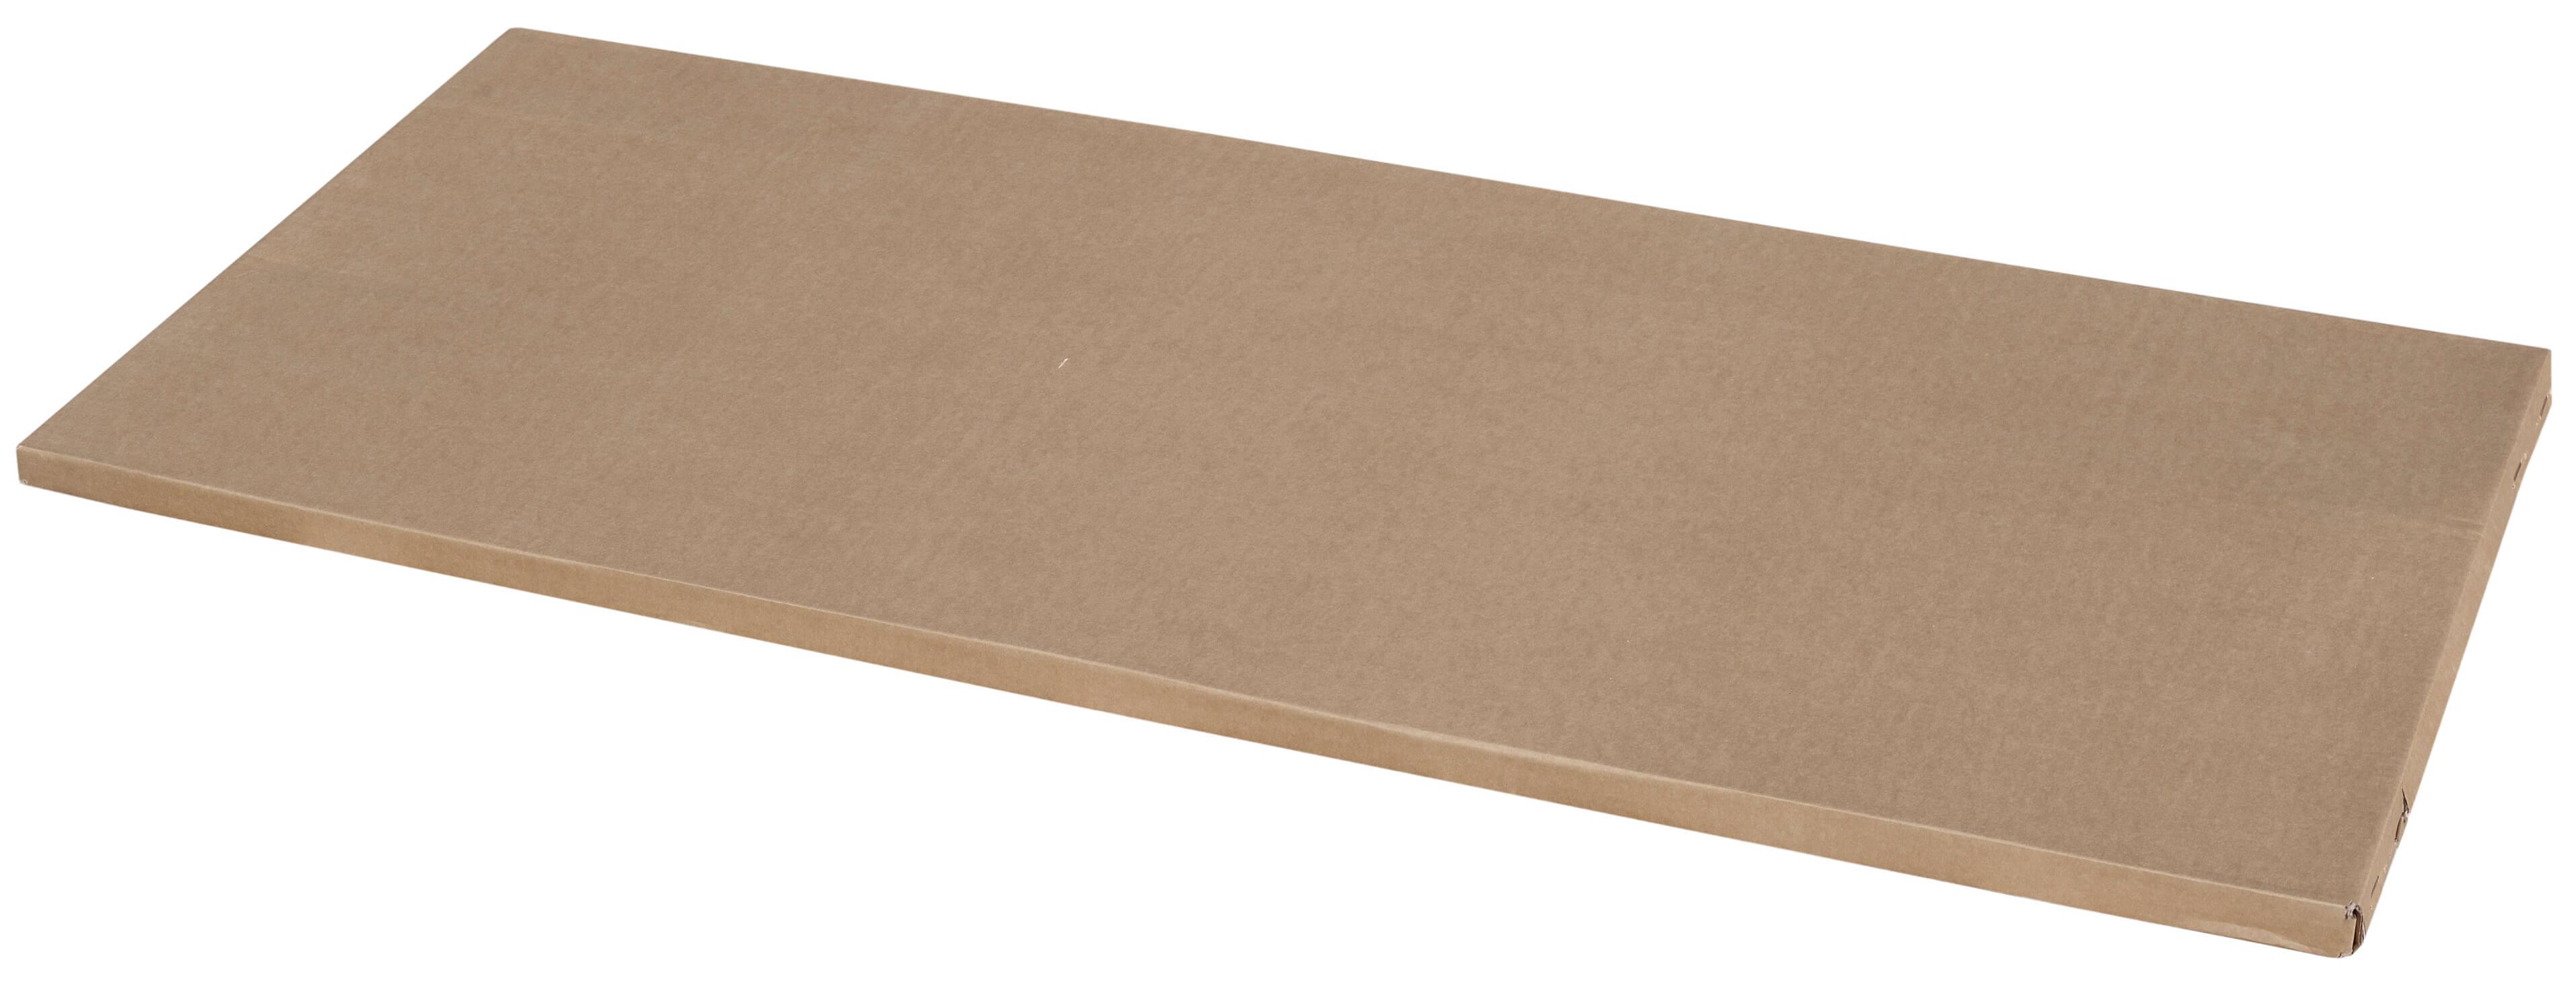 GVO Shed Box